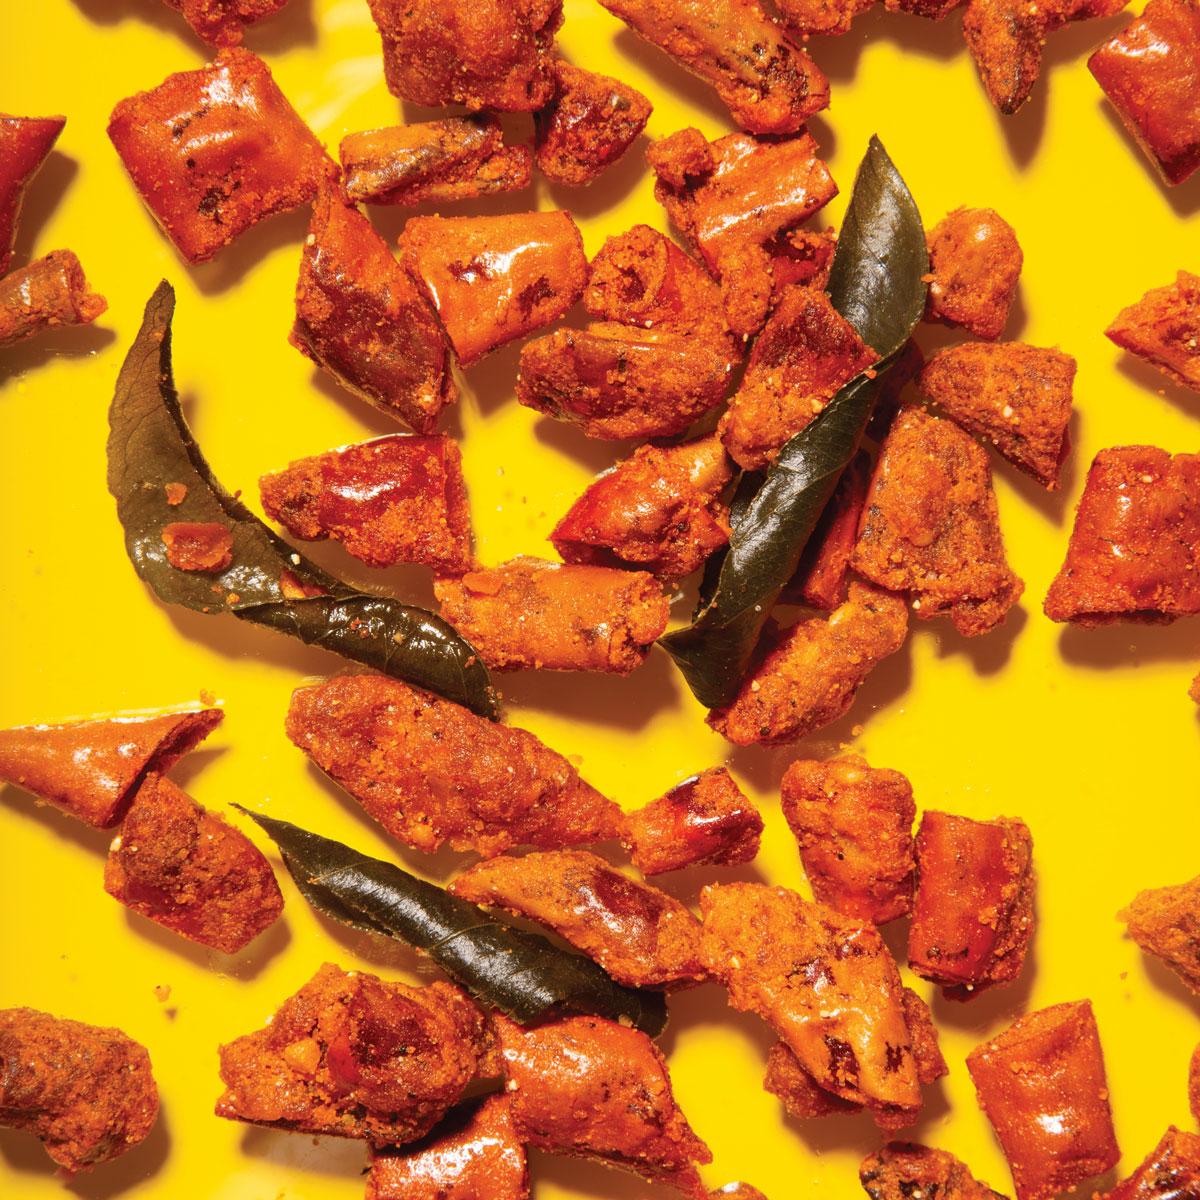 Fancy takeaway snacks made in restaurant kitchens